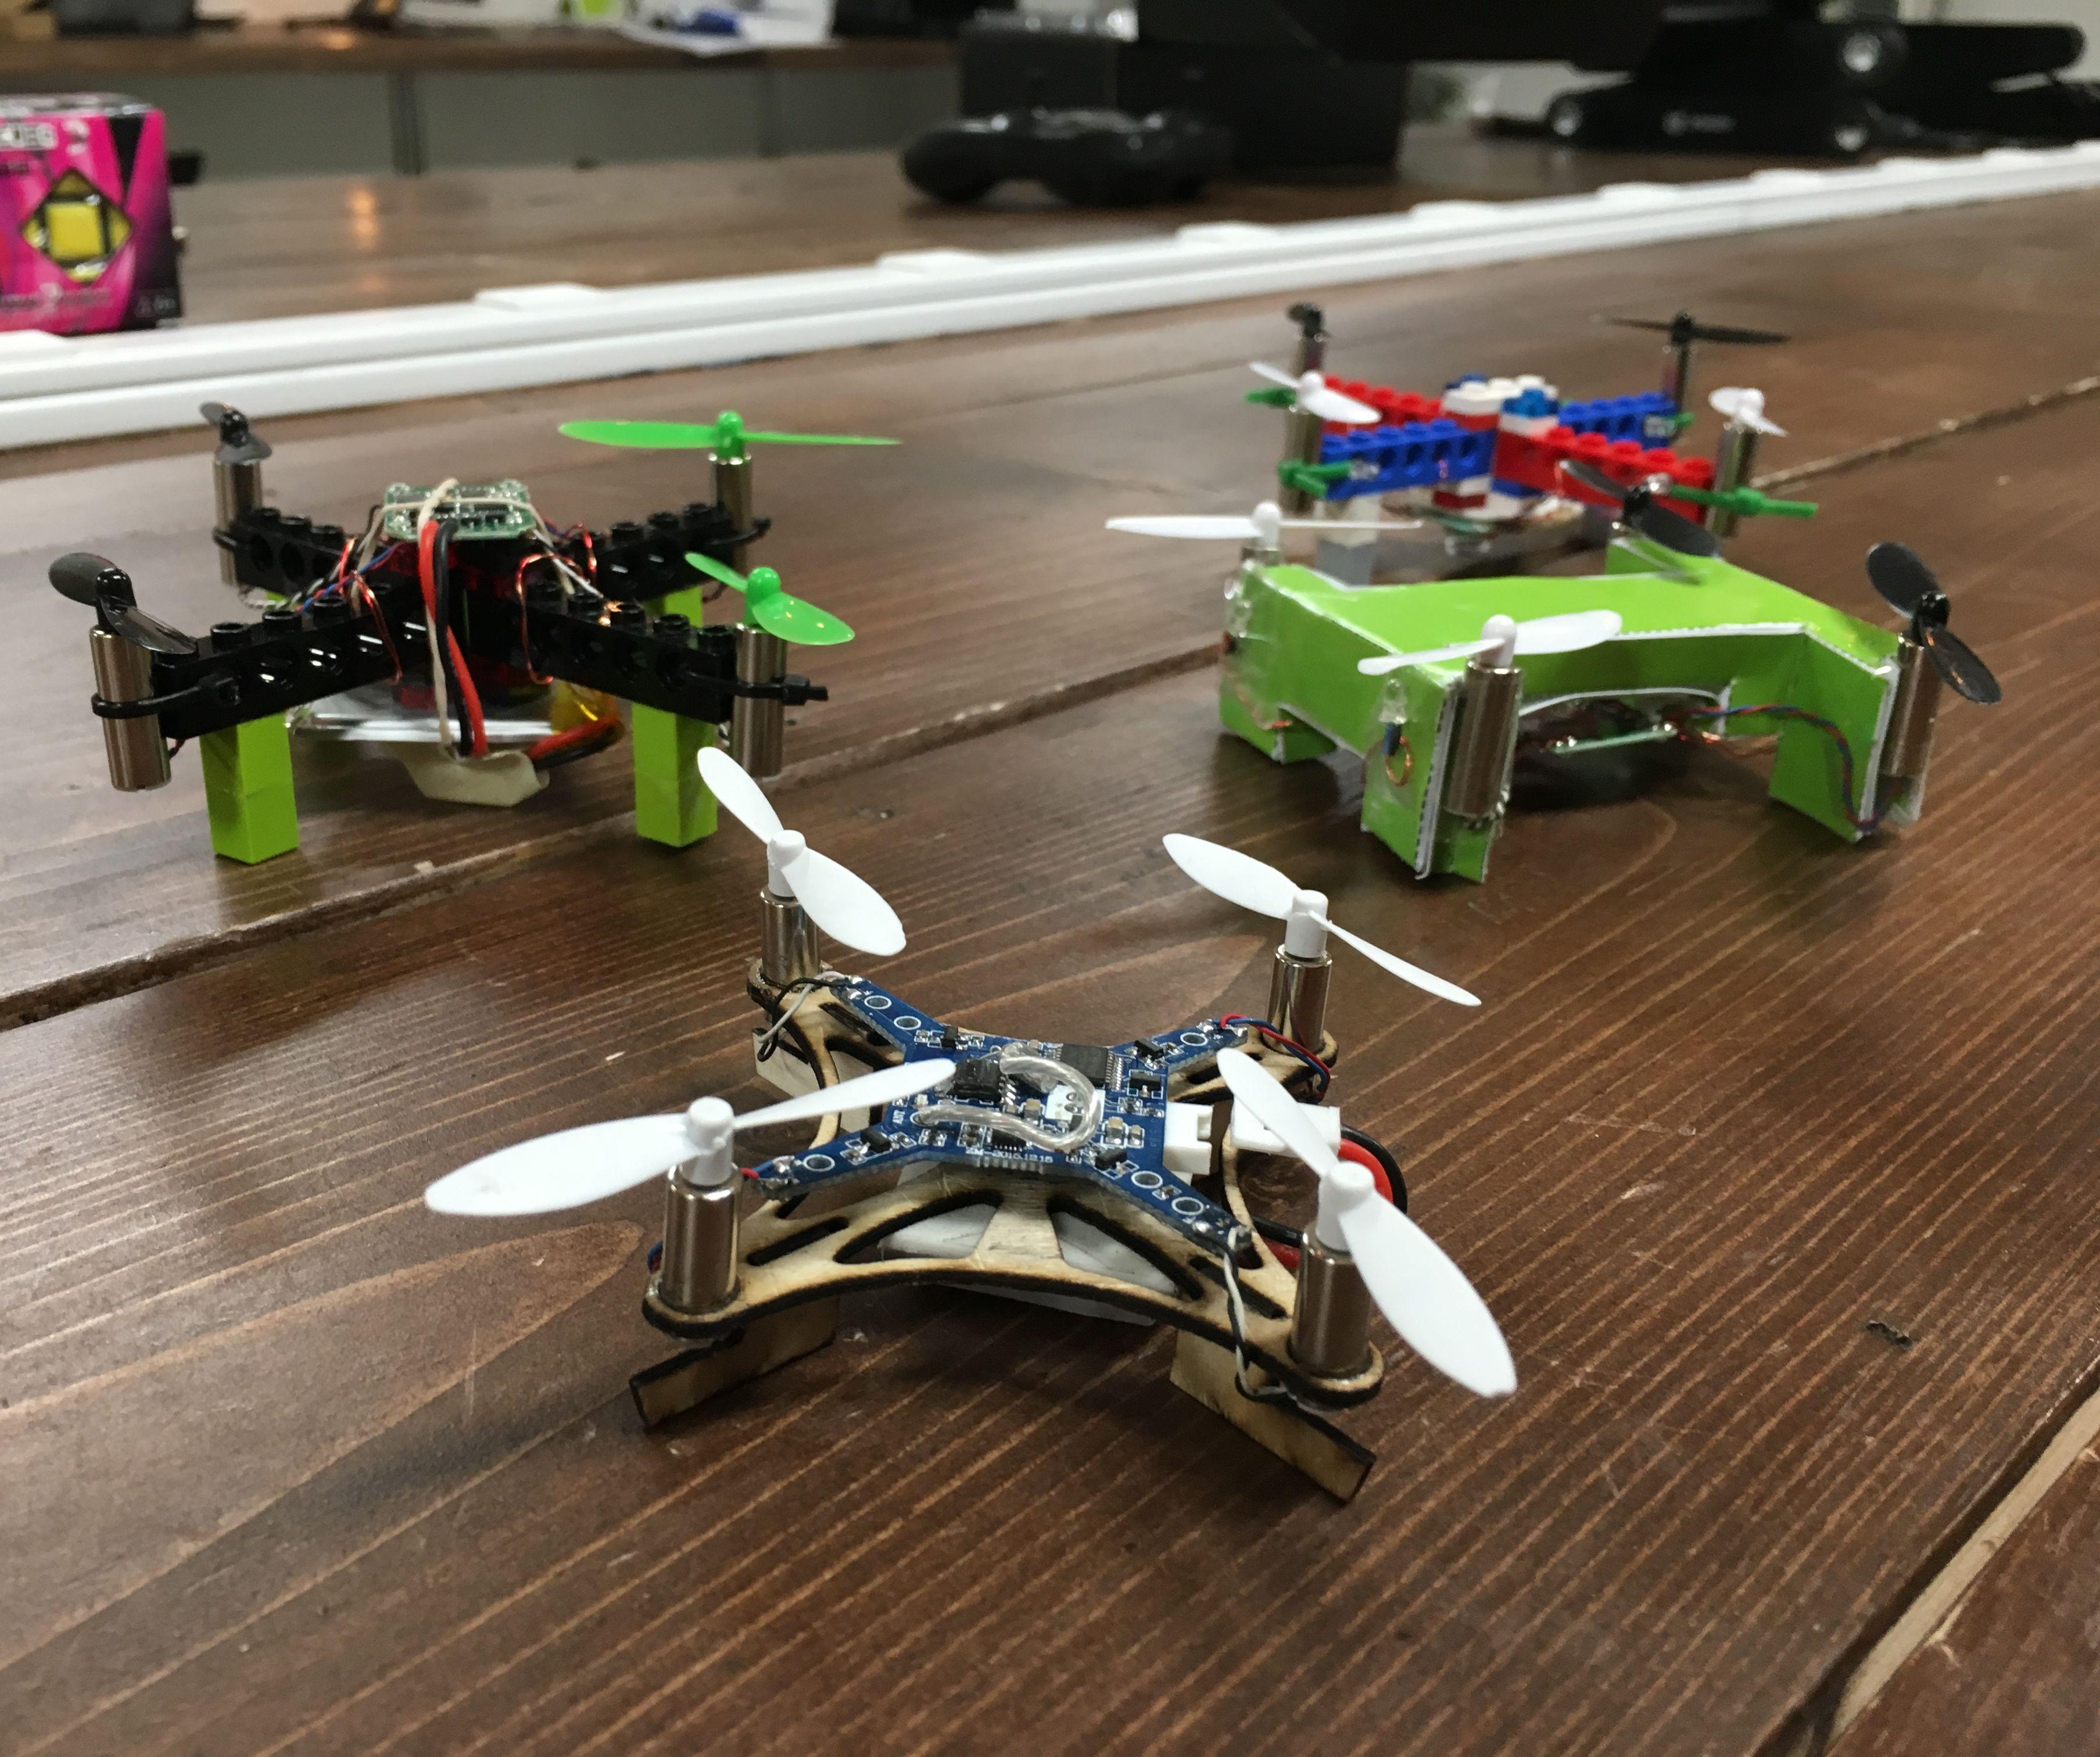 Mini Drone - Crash and Remake